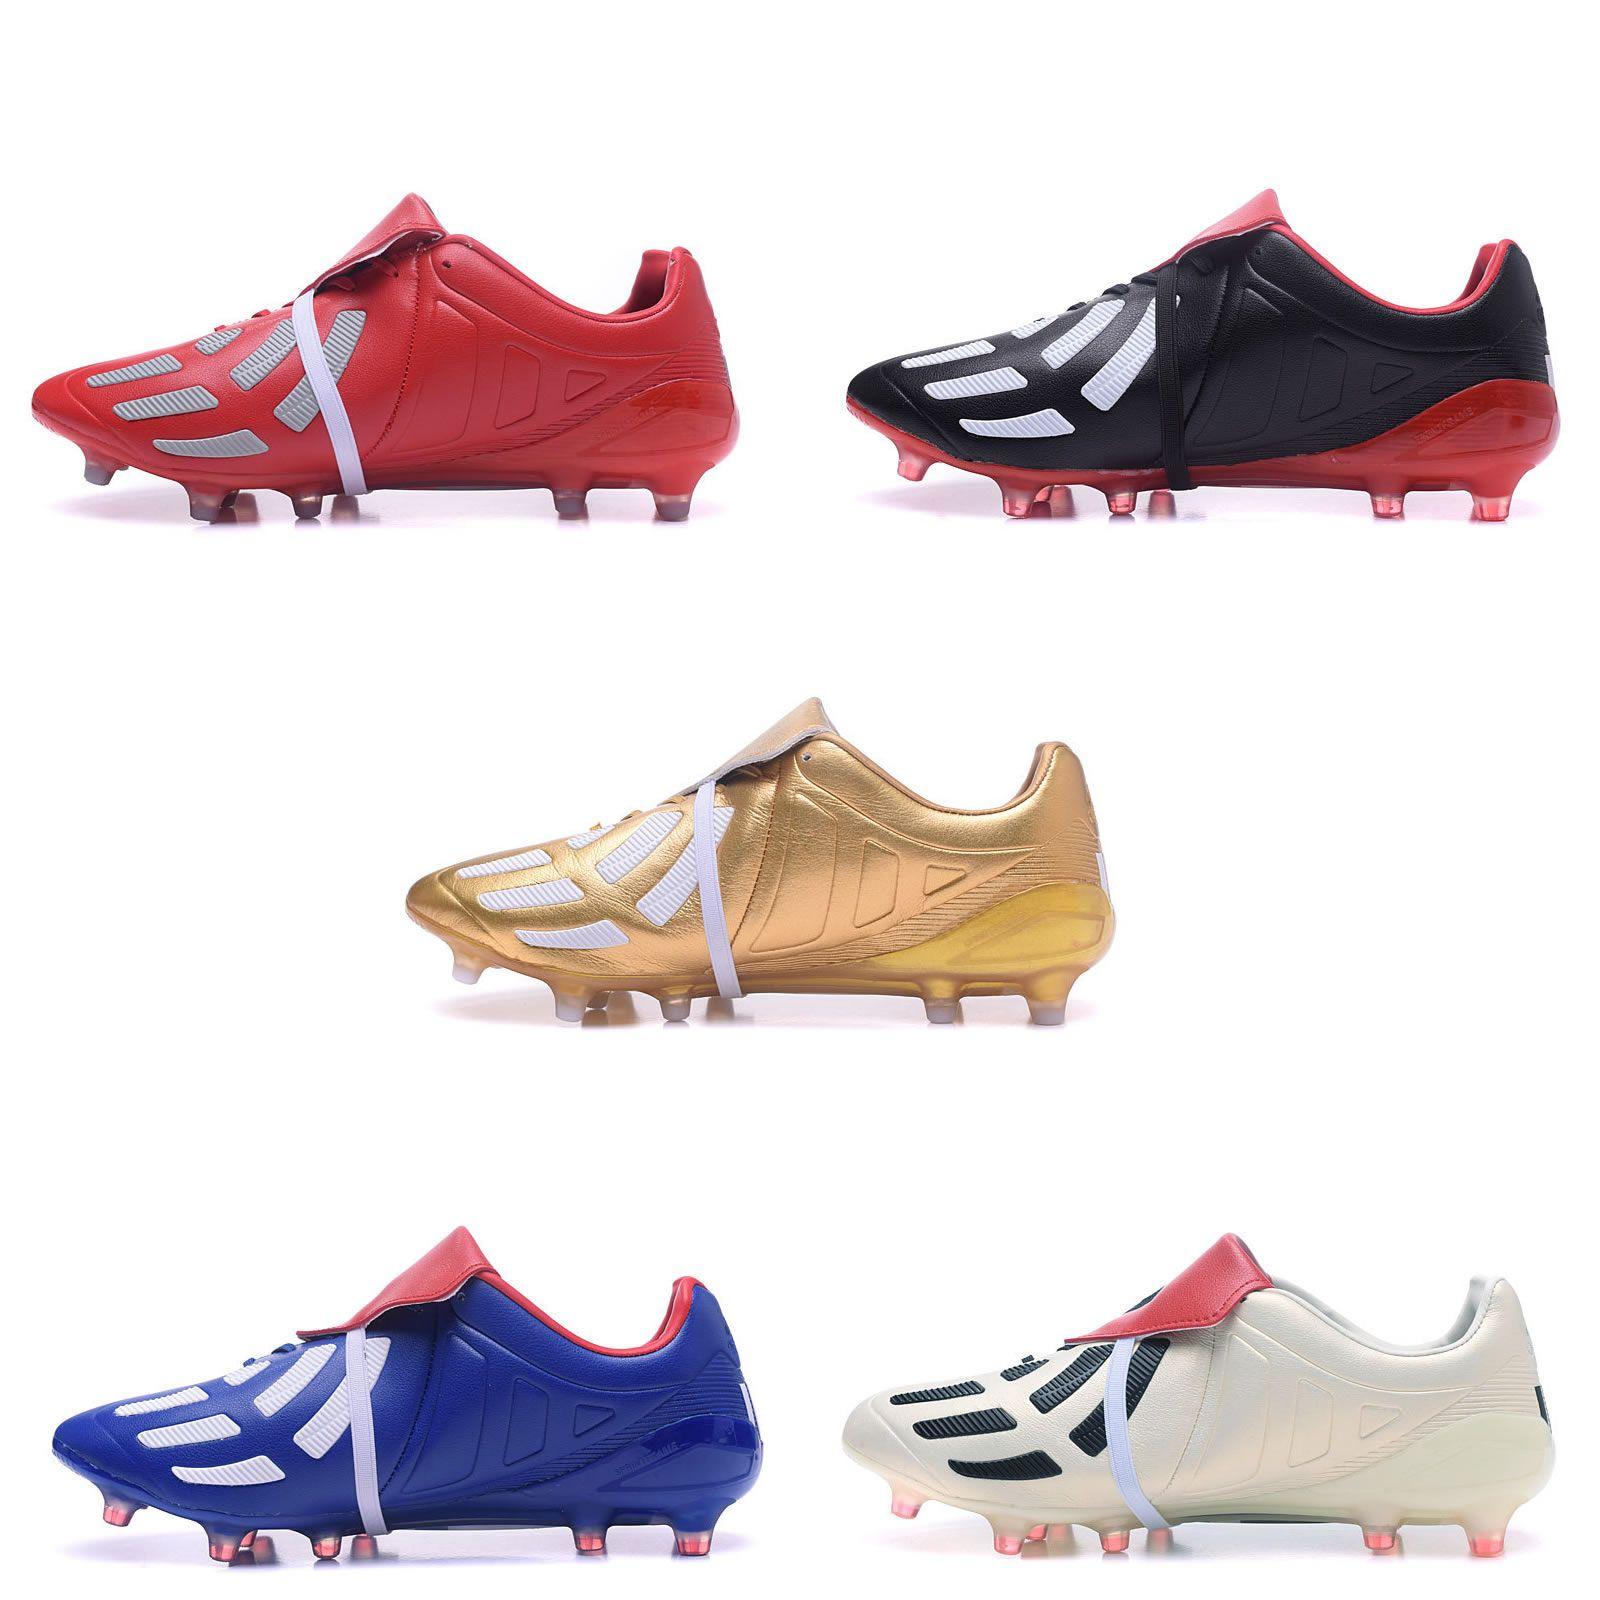 1e566d3be6c6 ... 2018 2017 predator mania champagne fg mens soccer cleats shoes boots  original quality ace 17 mens